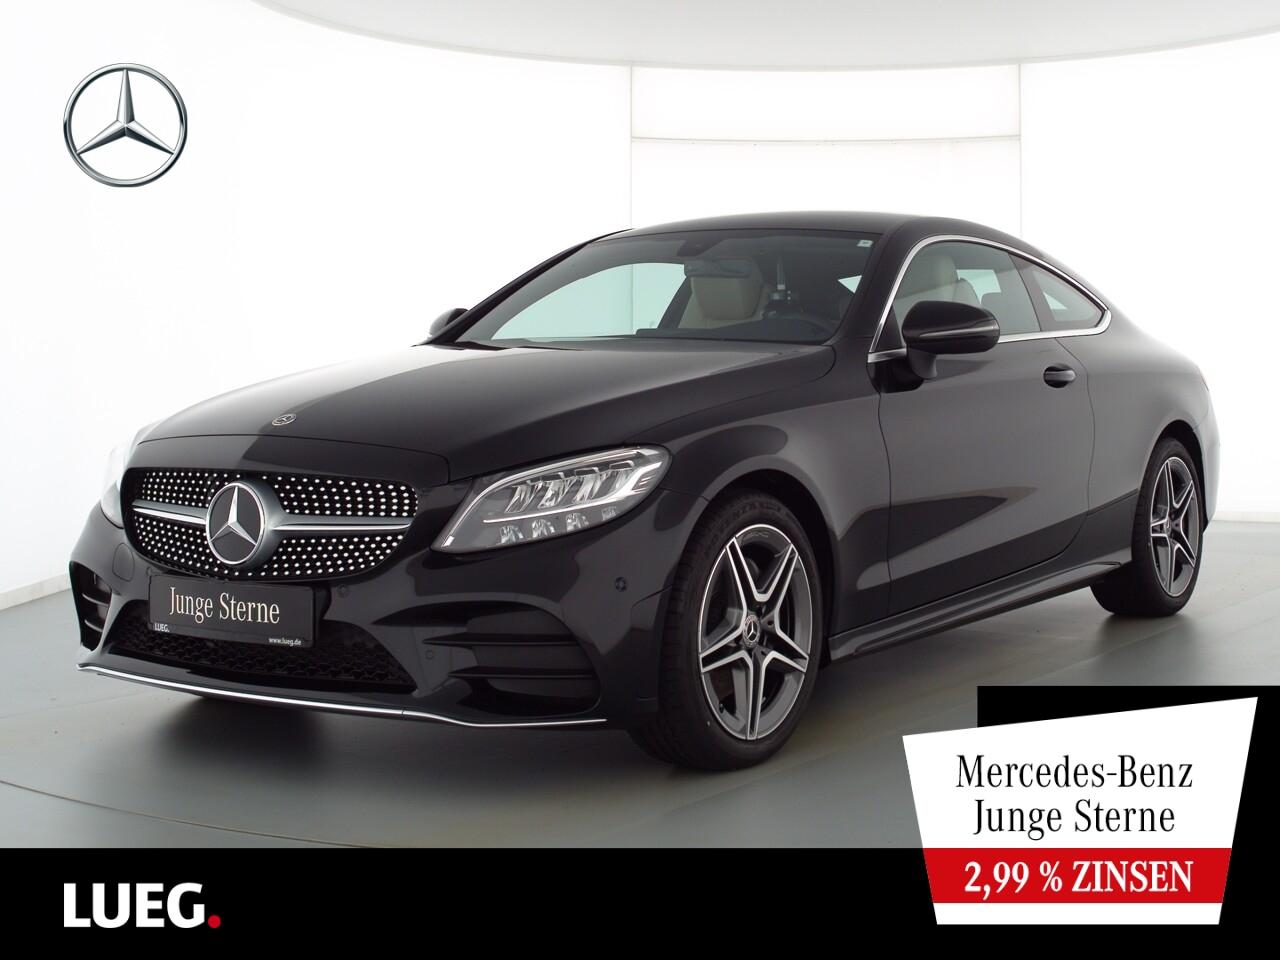 Mercedes-Benz C 180 Coupe AMG+Navi+LED-HP+CarPl+ParkAss+Kamera, Jahr 2020, Benzin